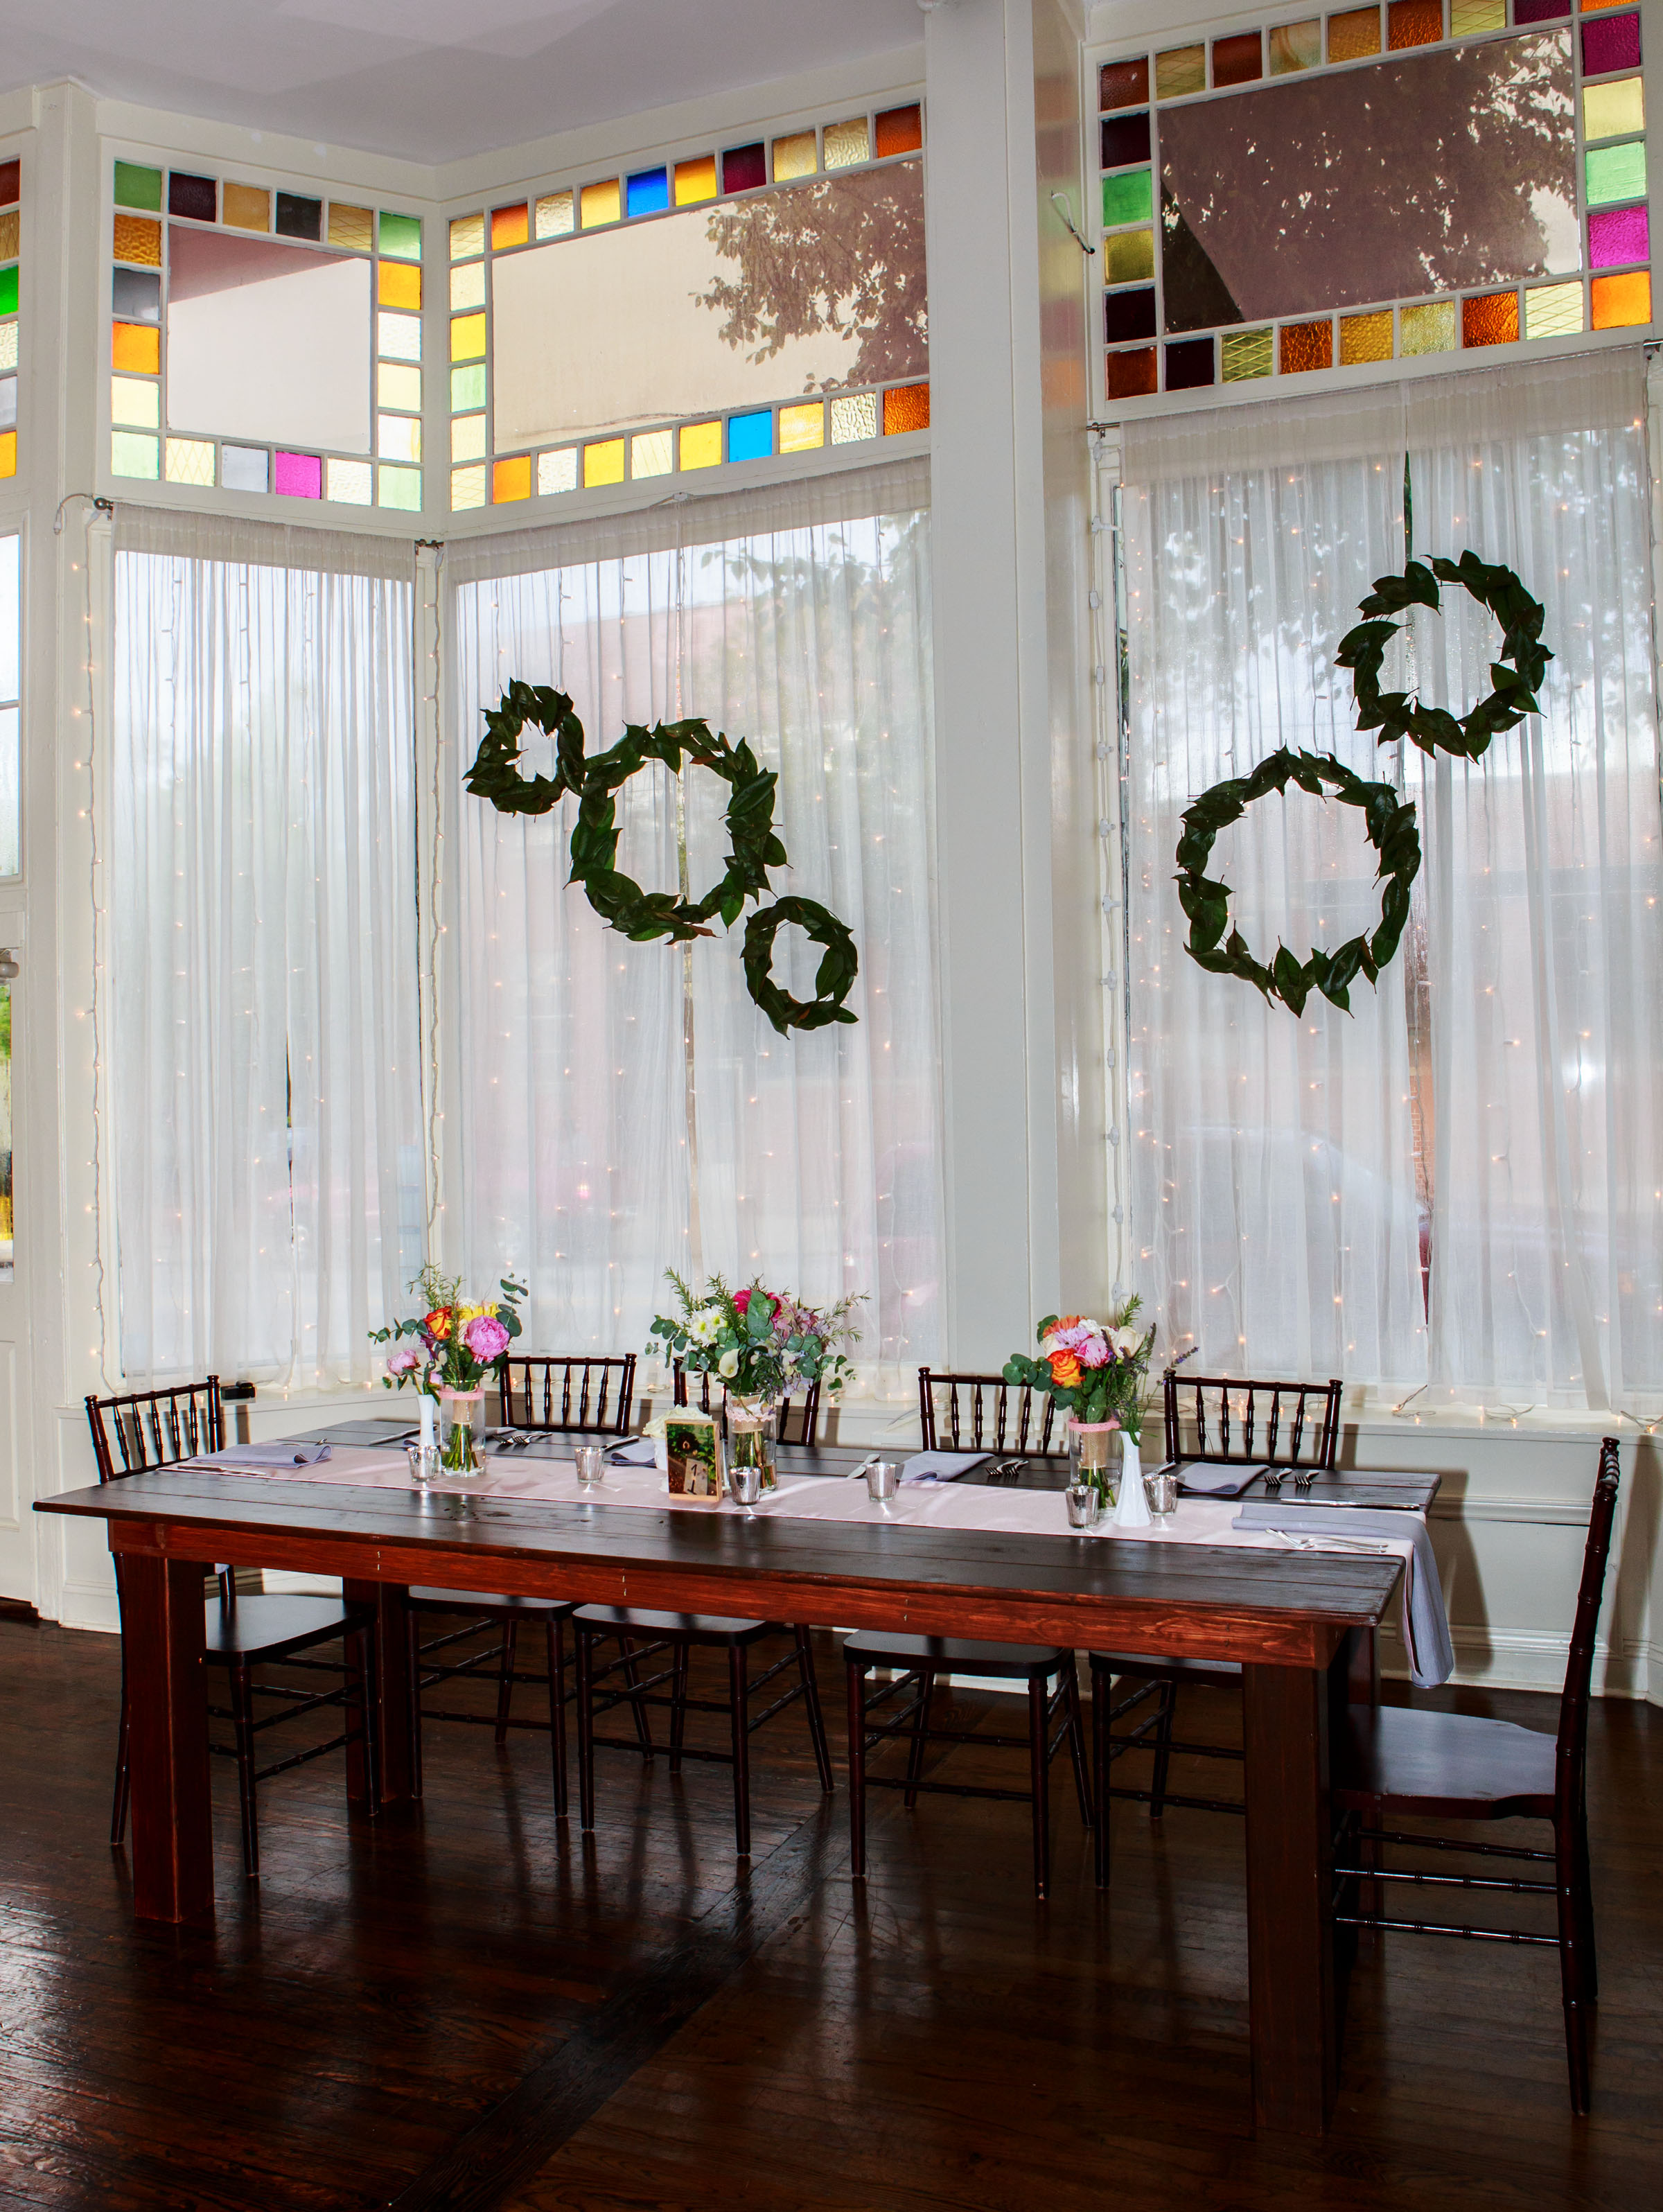 128-South-Wedding-Tiffany-Abruzzo-Photography-Details-60.jpg